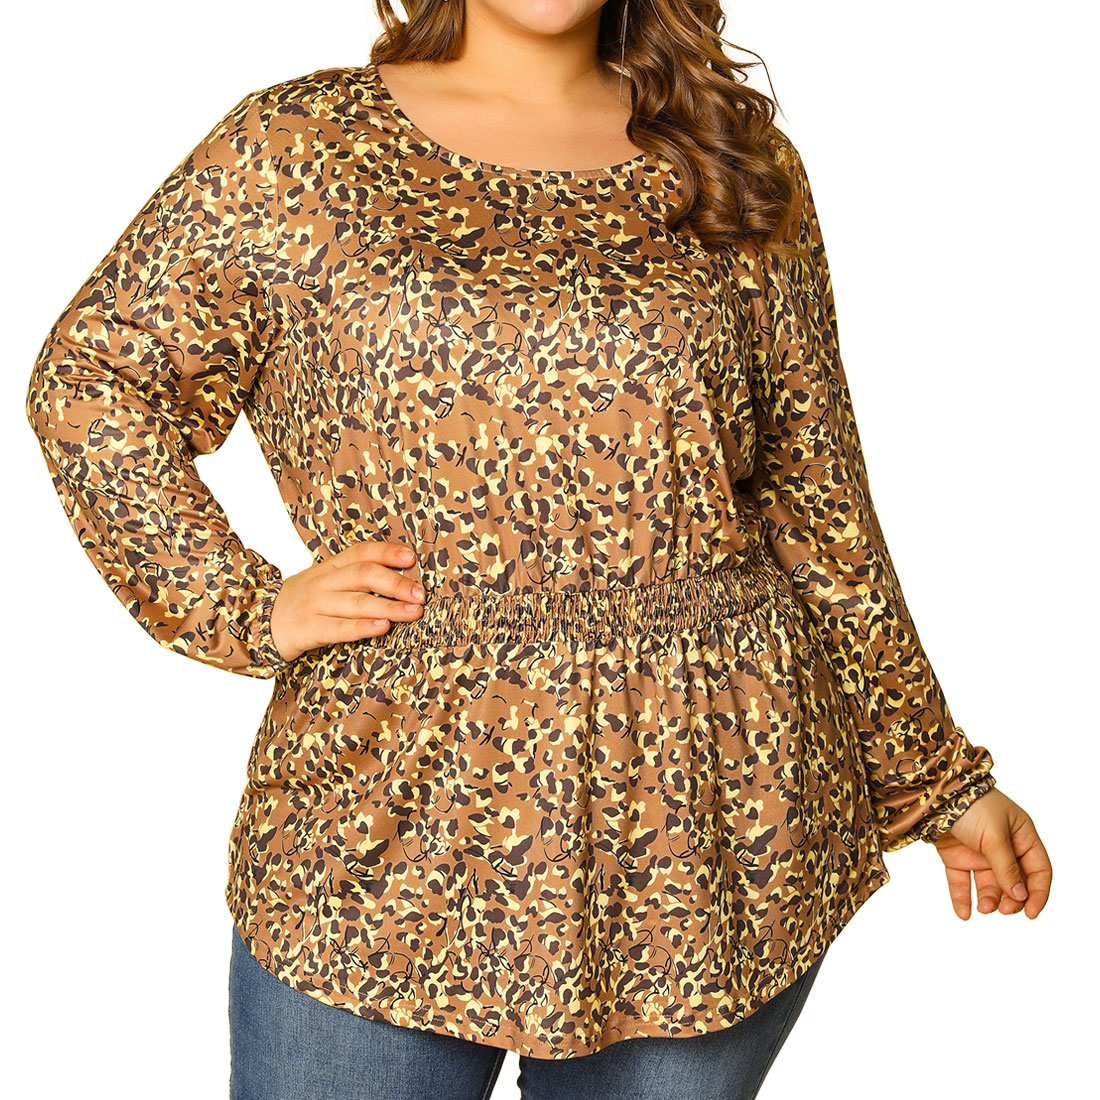 Women's Plus Size Blouse Floral Leopard Long Sleeve Tops Brown 3X